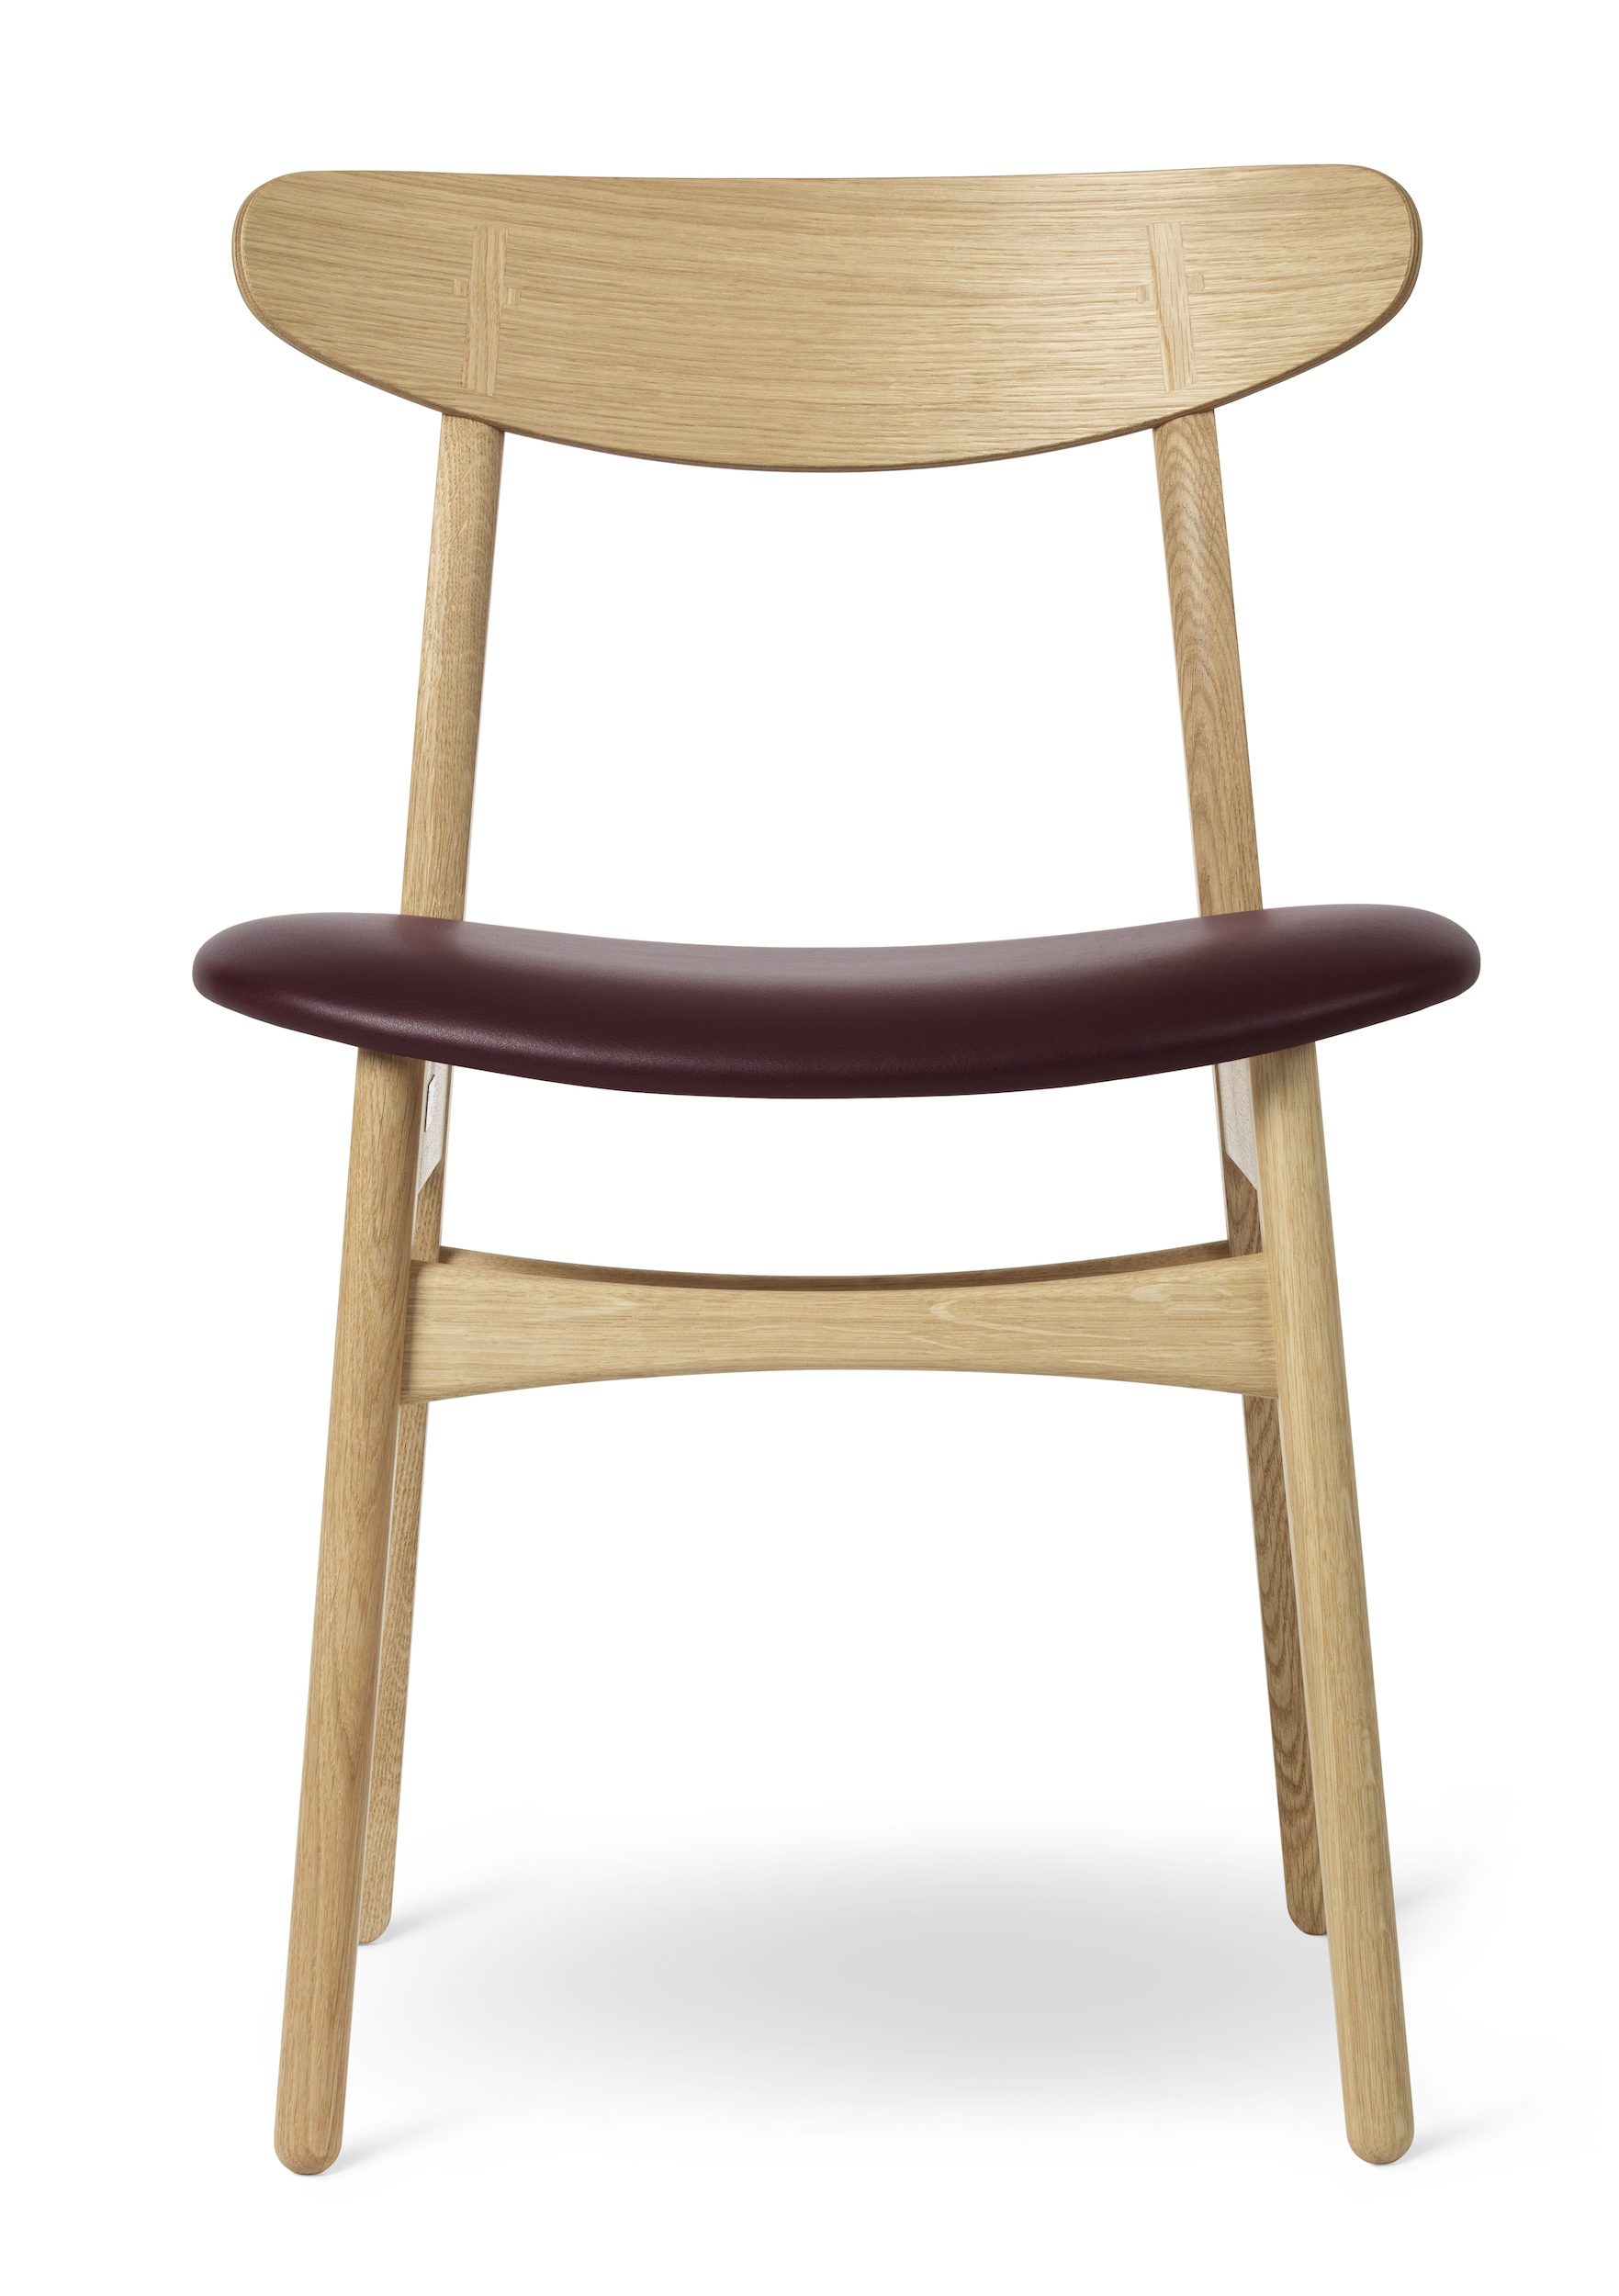 Carl Hansen Sn CH30 Chair Design Hans Wegner 1954